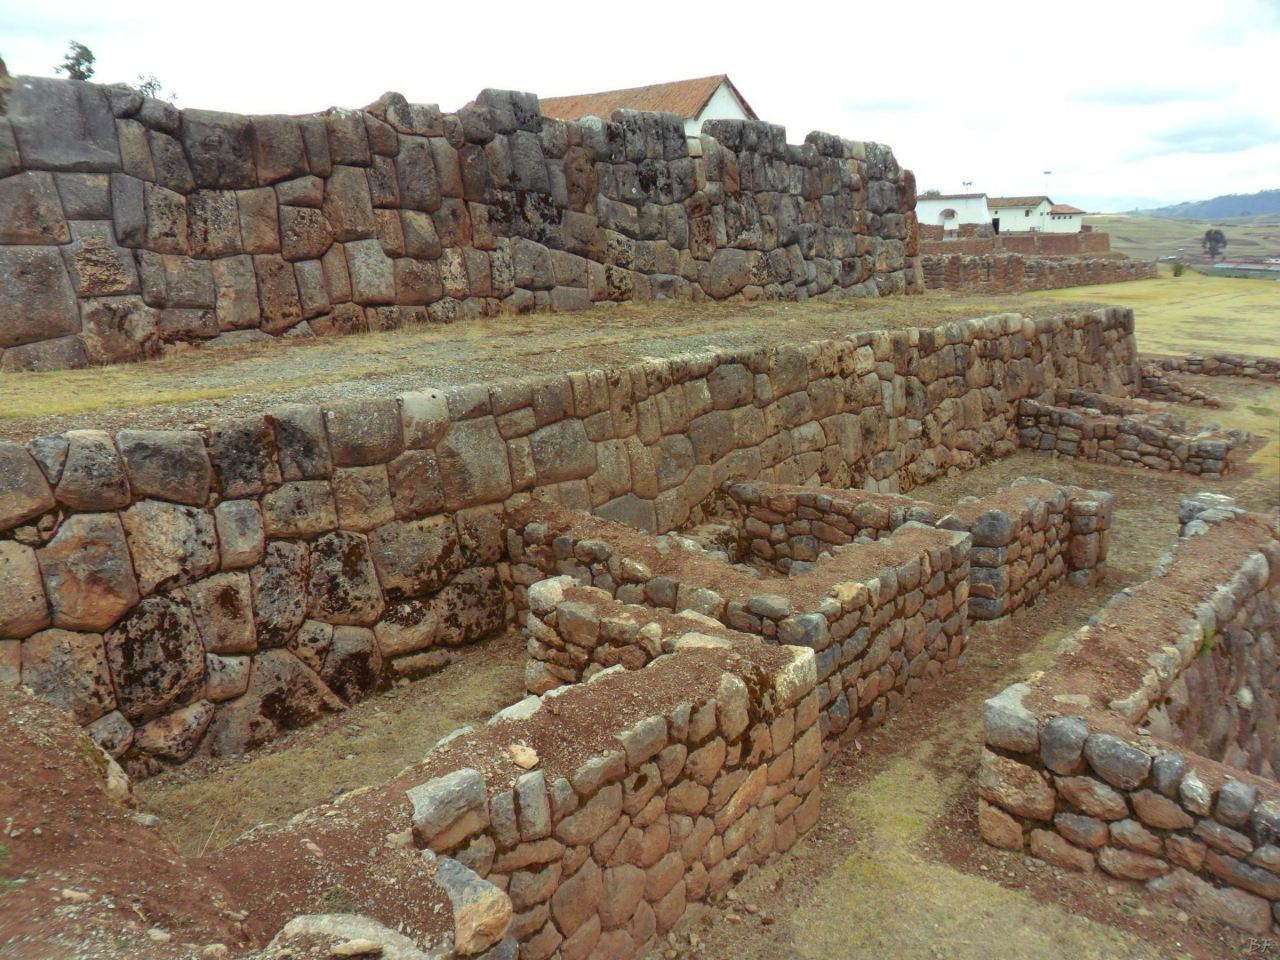 Chinchero-Mura-Poligonali-Piramide-Urubamba-Peru-42